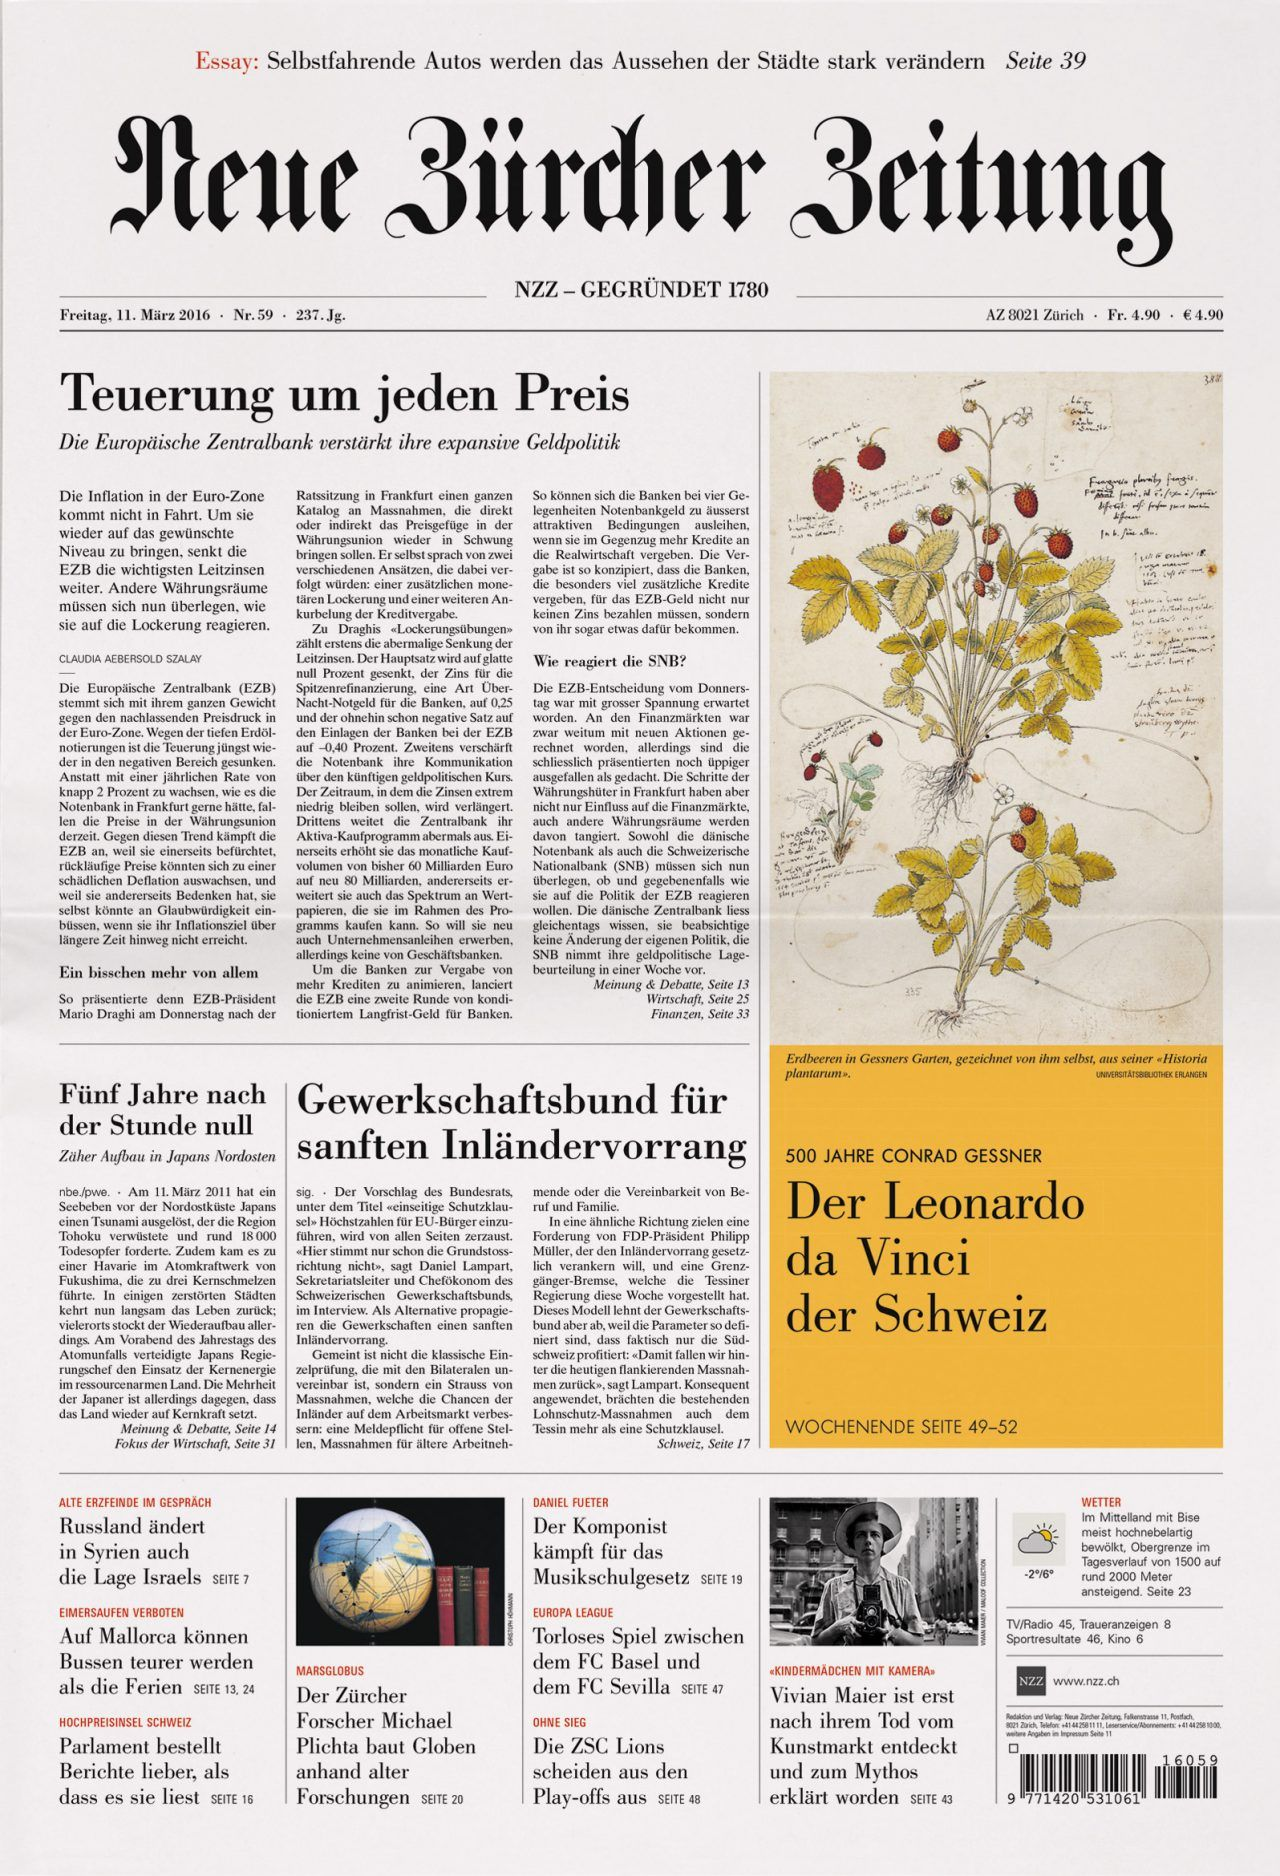 http://meireundmeire.com/nzz-mediengruppen_neue-zurcher-zeitung ...